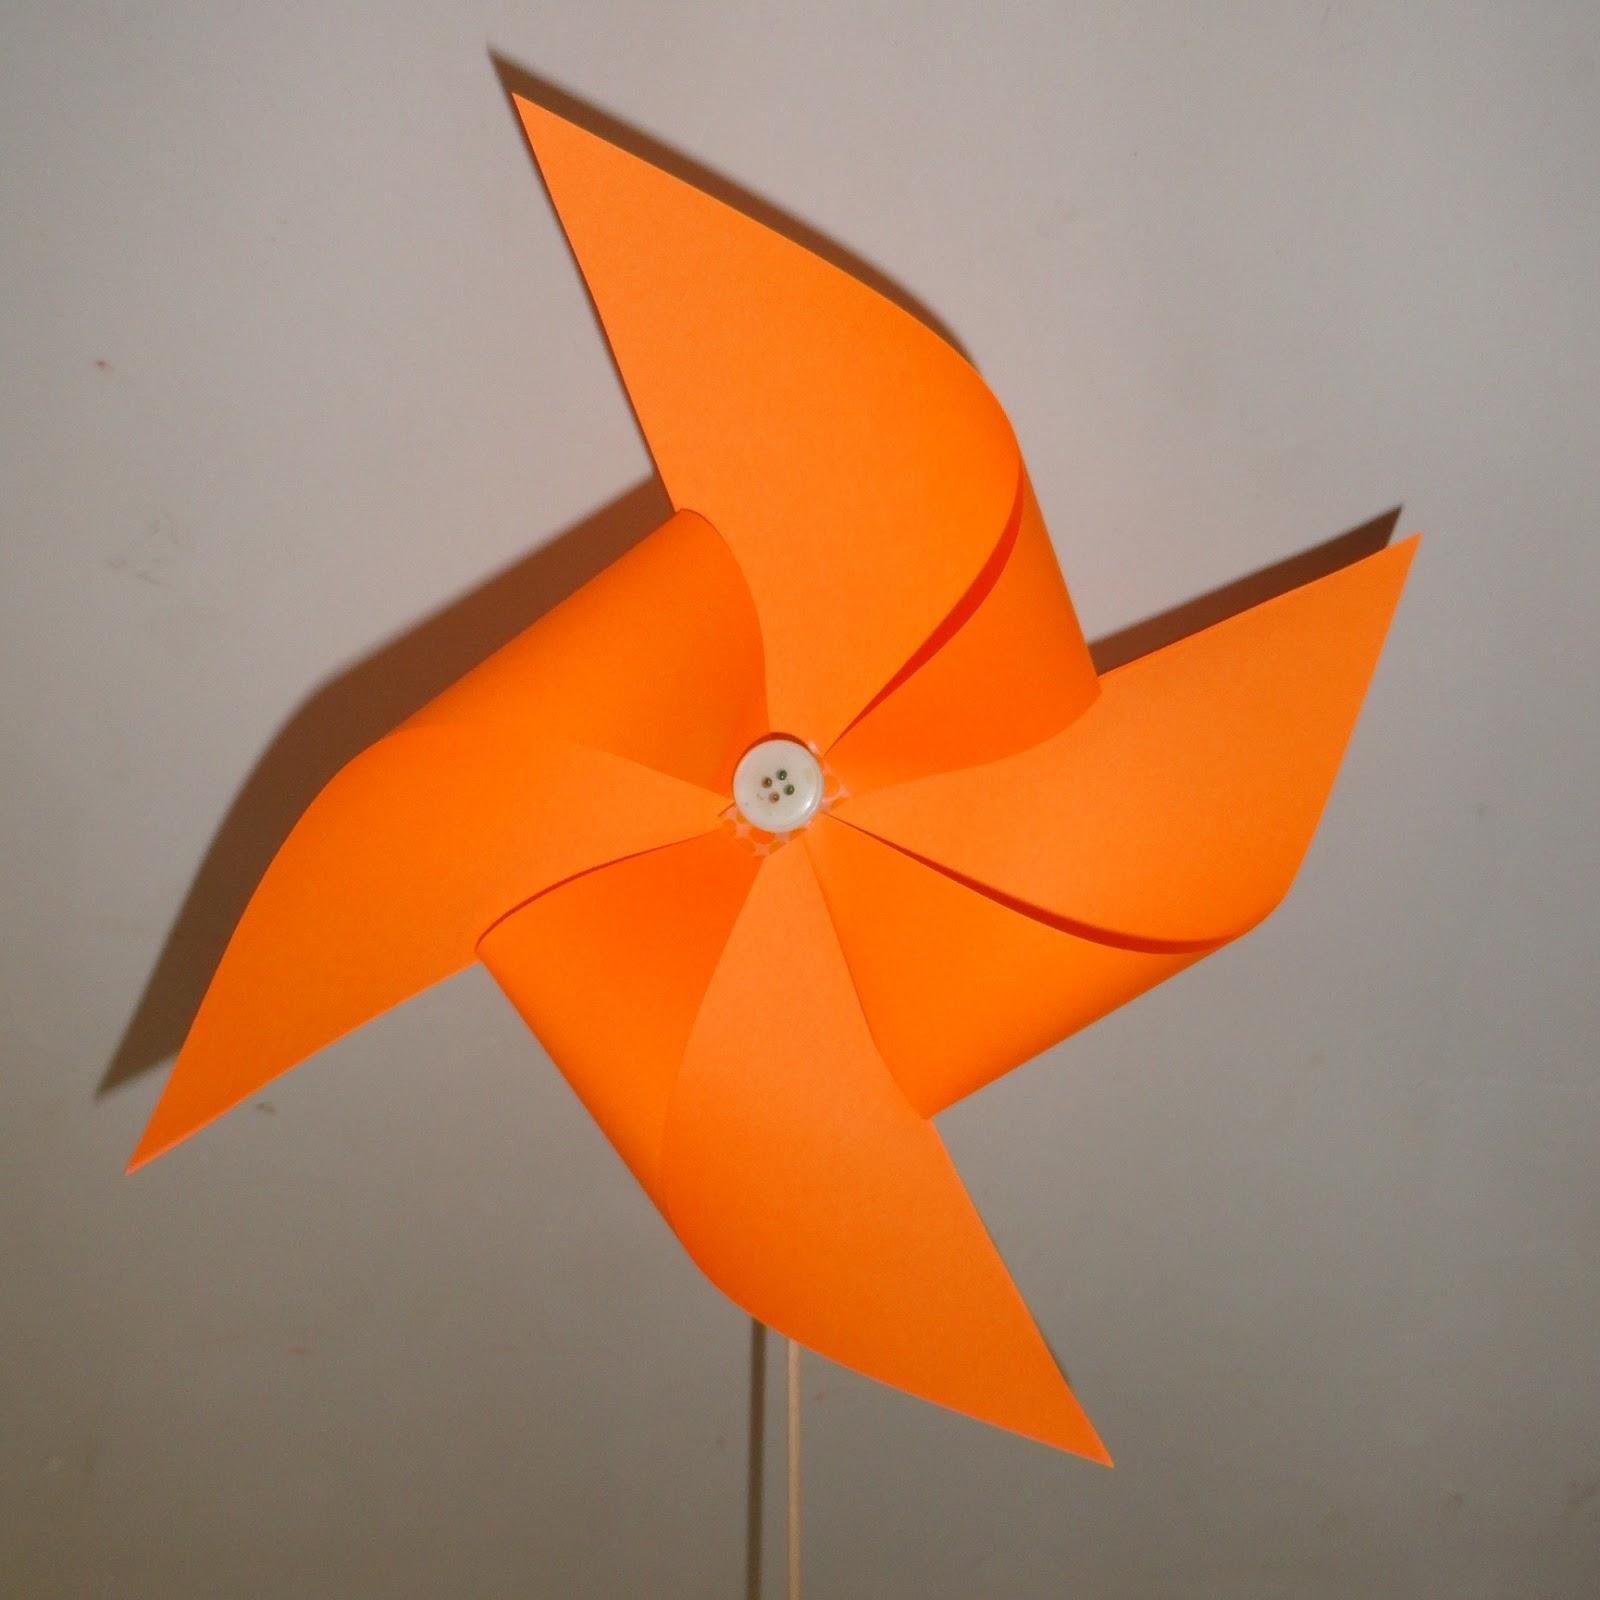 chauffe inox industriel france fabriquer moulin a vent qui tourne. Black Bedroom Furniture Sets. Home Design Ideas